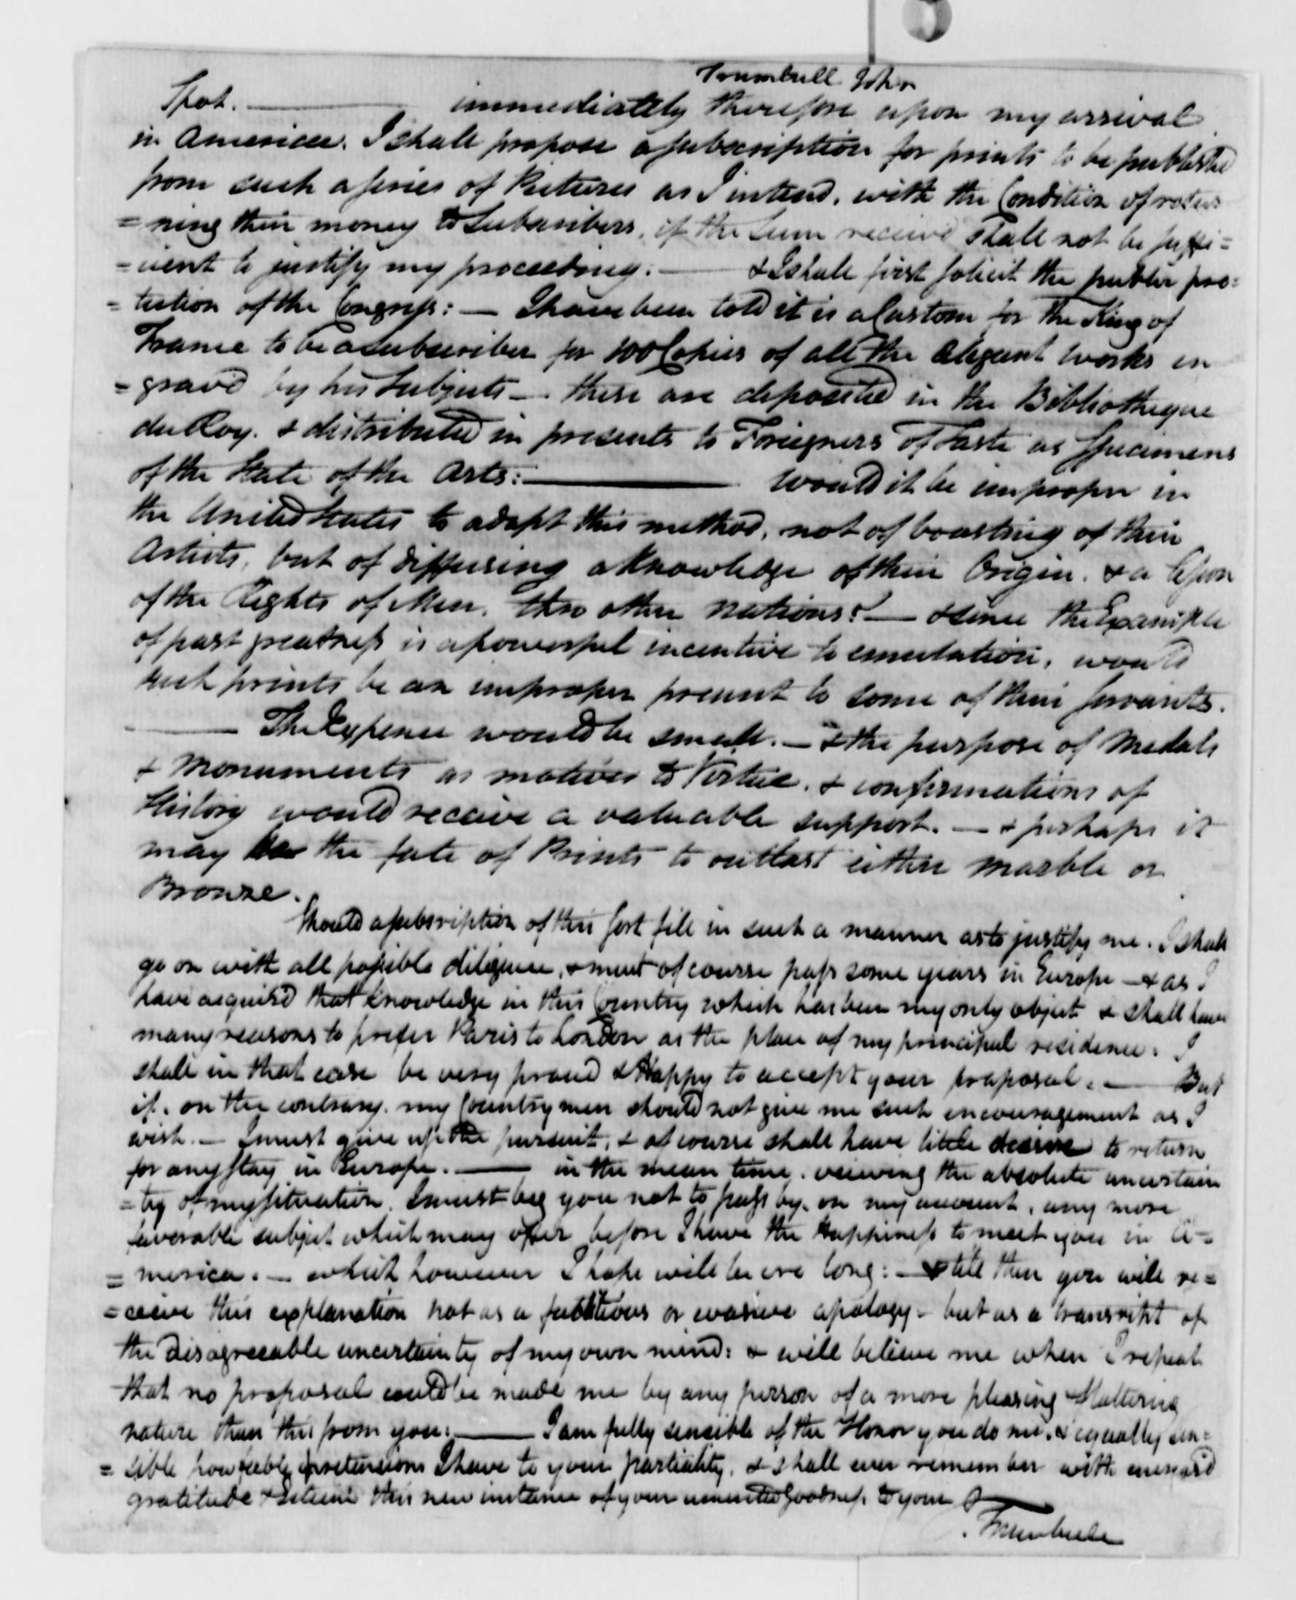 John Trumbull to Thomas Jefferson, June 11, 1789